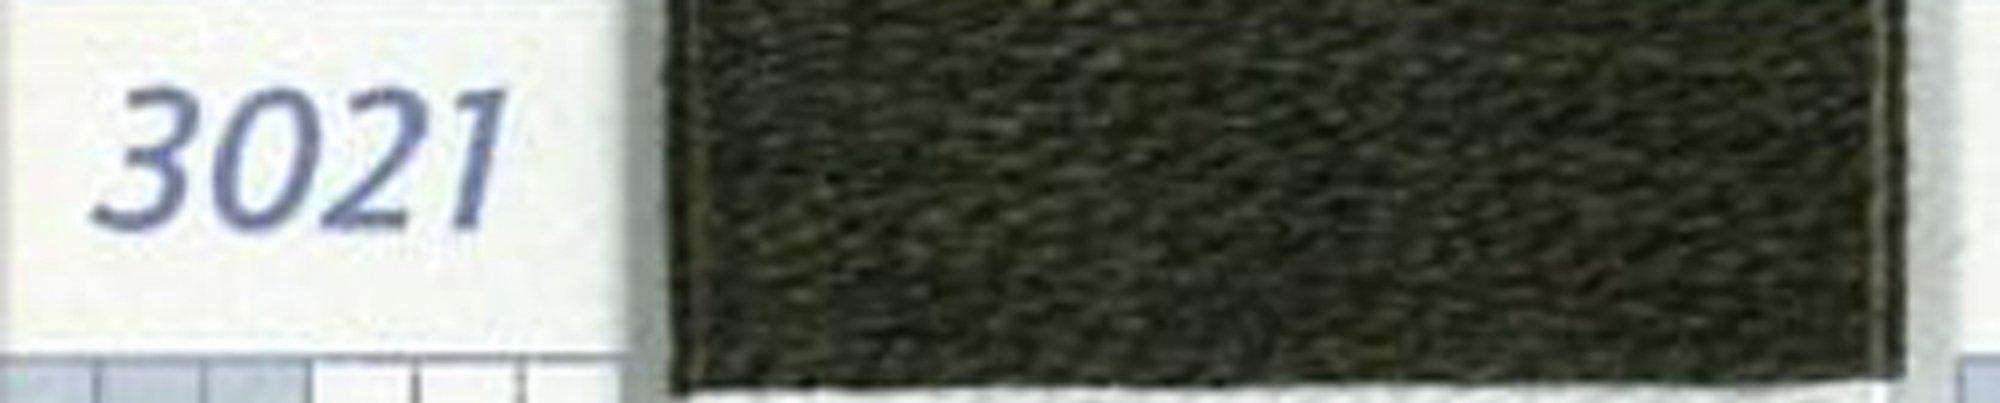 DP3-3021-VY DK BROWN GRAY